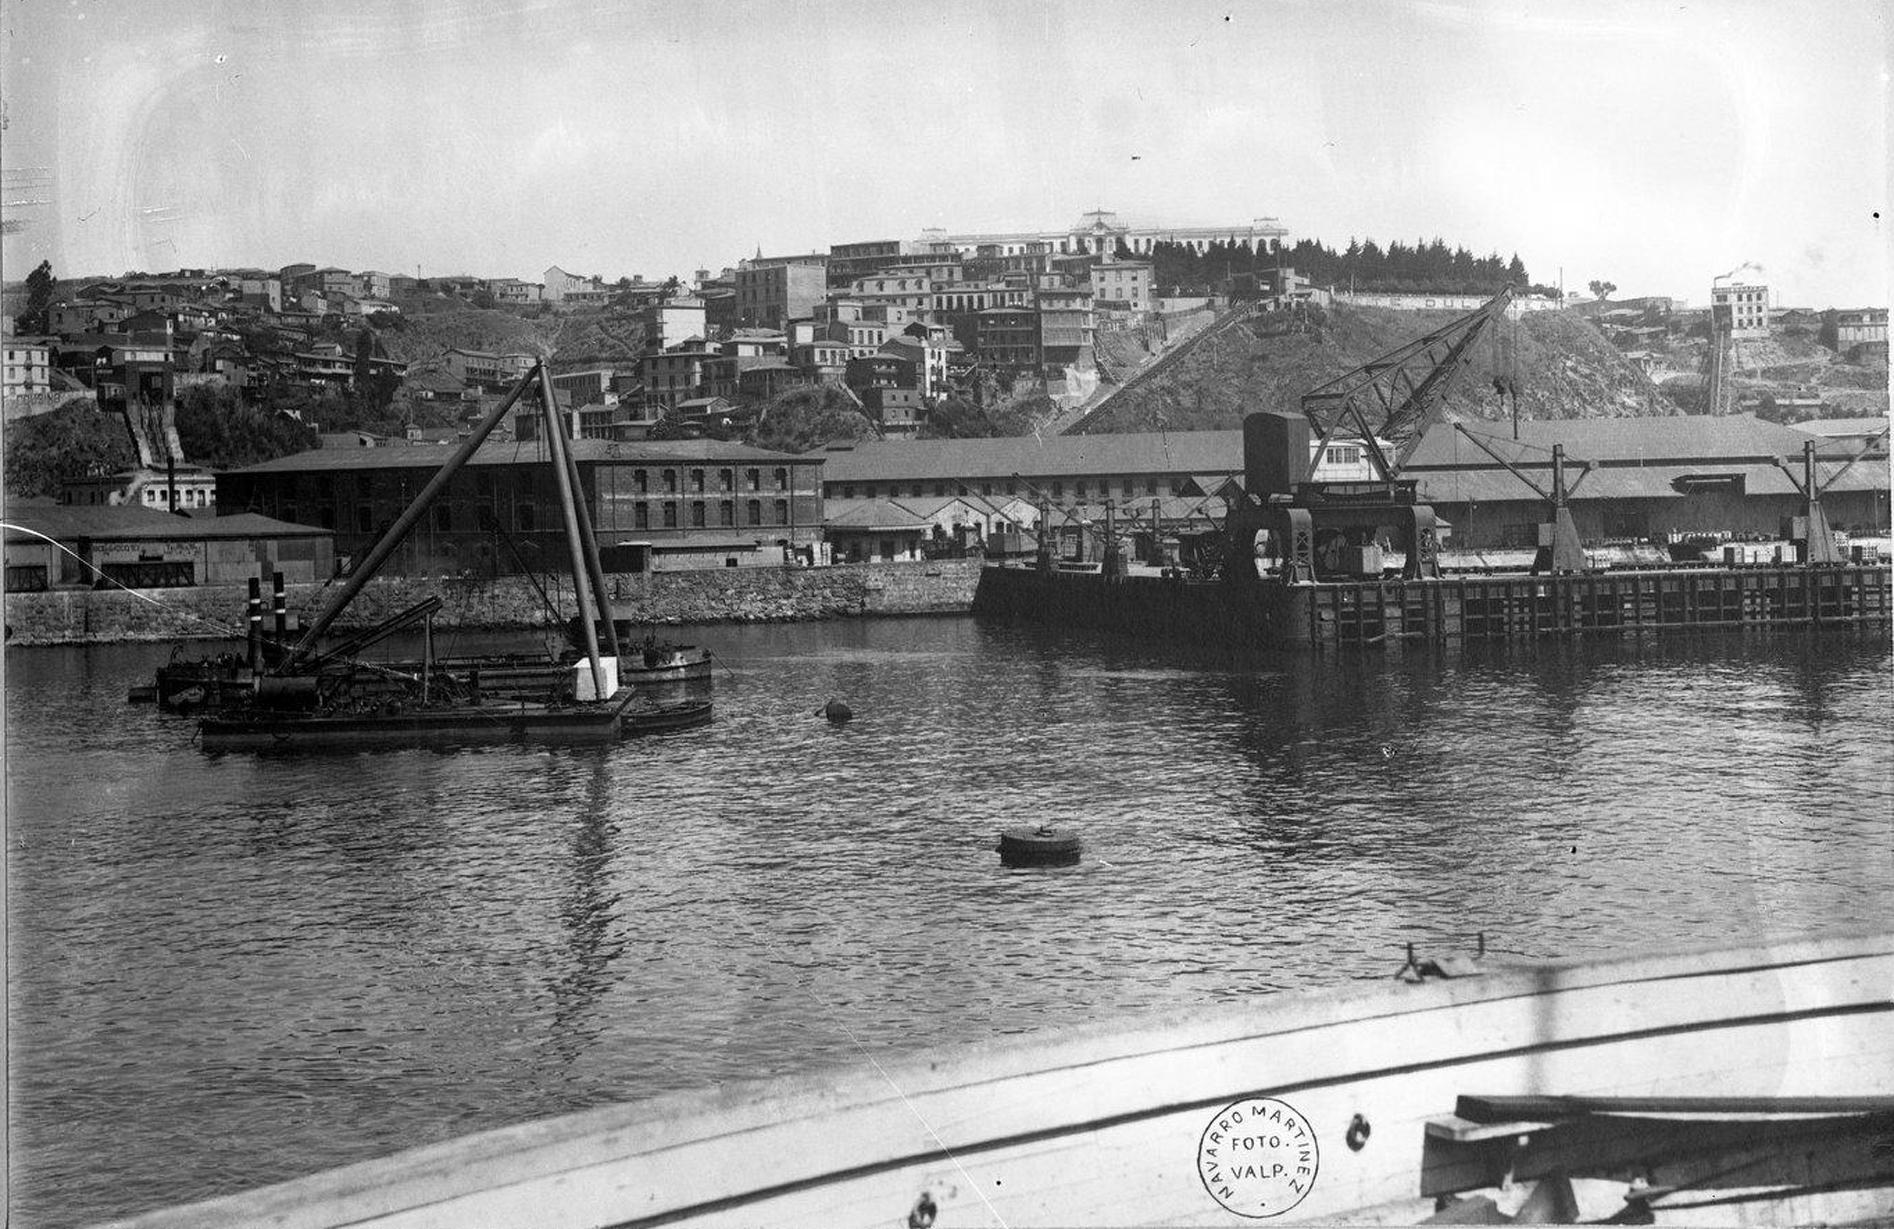 Enterreno - Fotos históricas de chile - fotos antiguas de Chile - Museo Marítimo Nacional en 1911